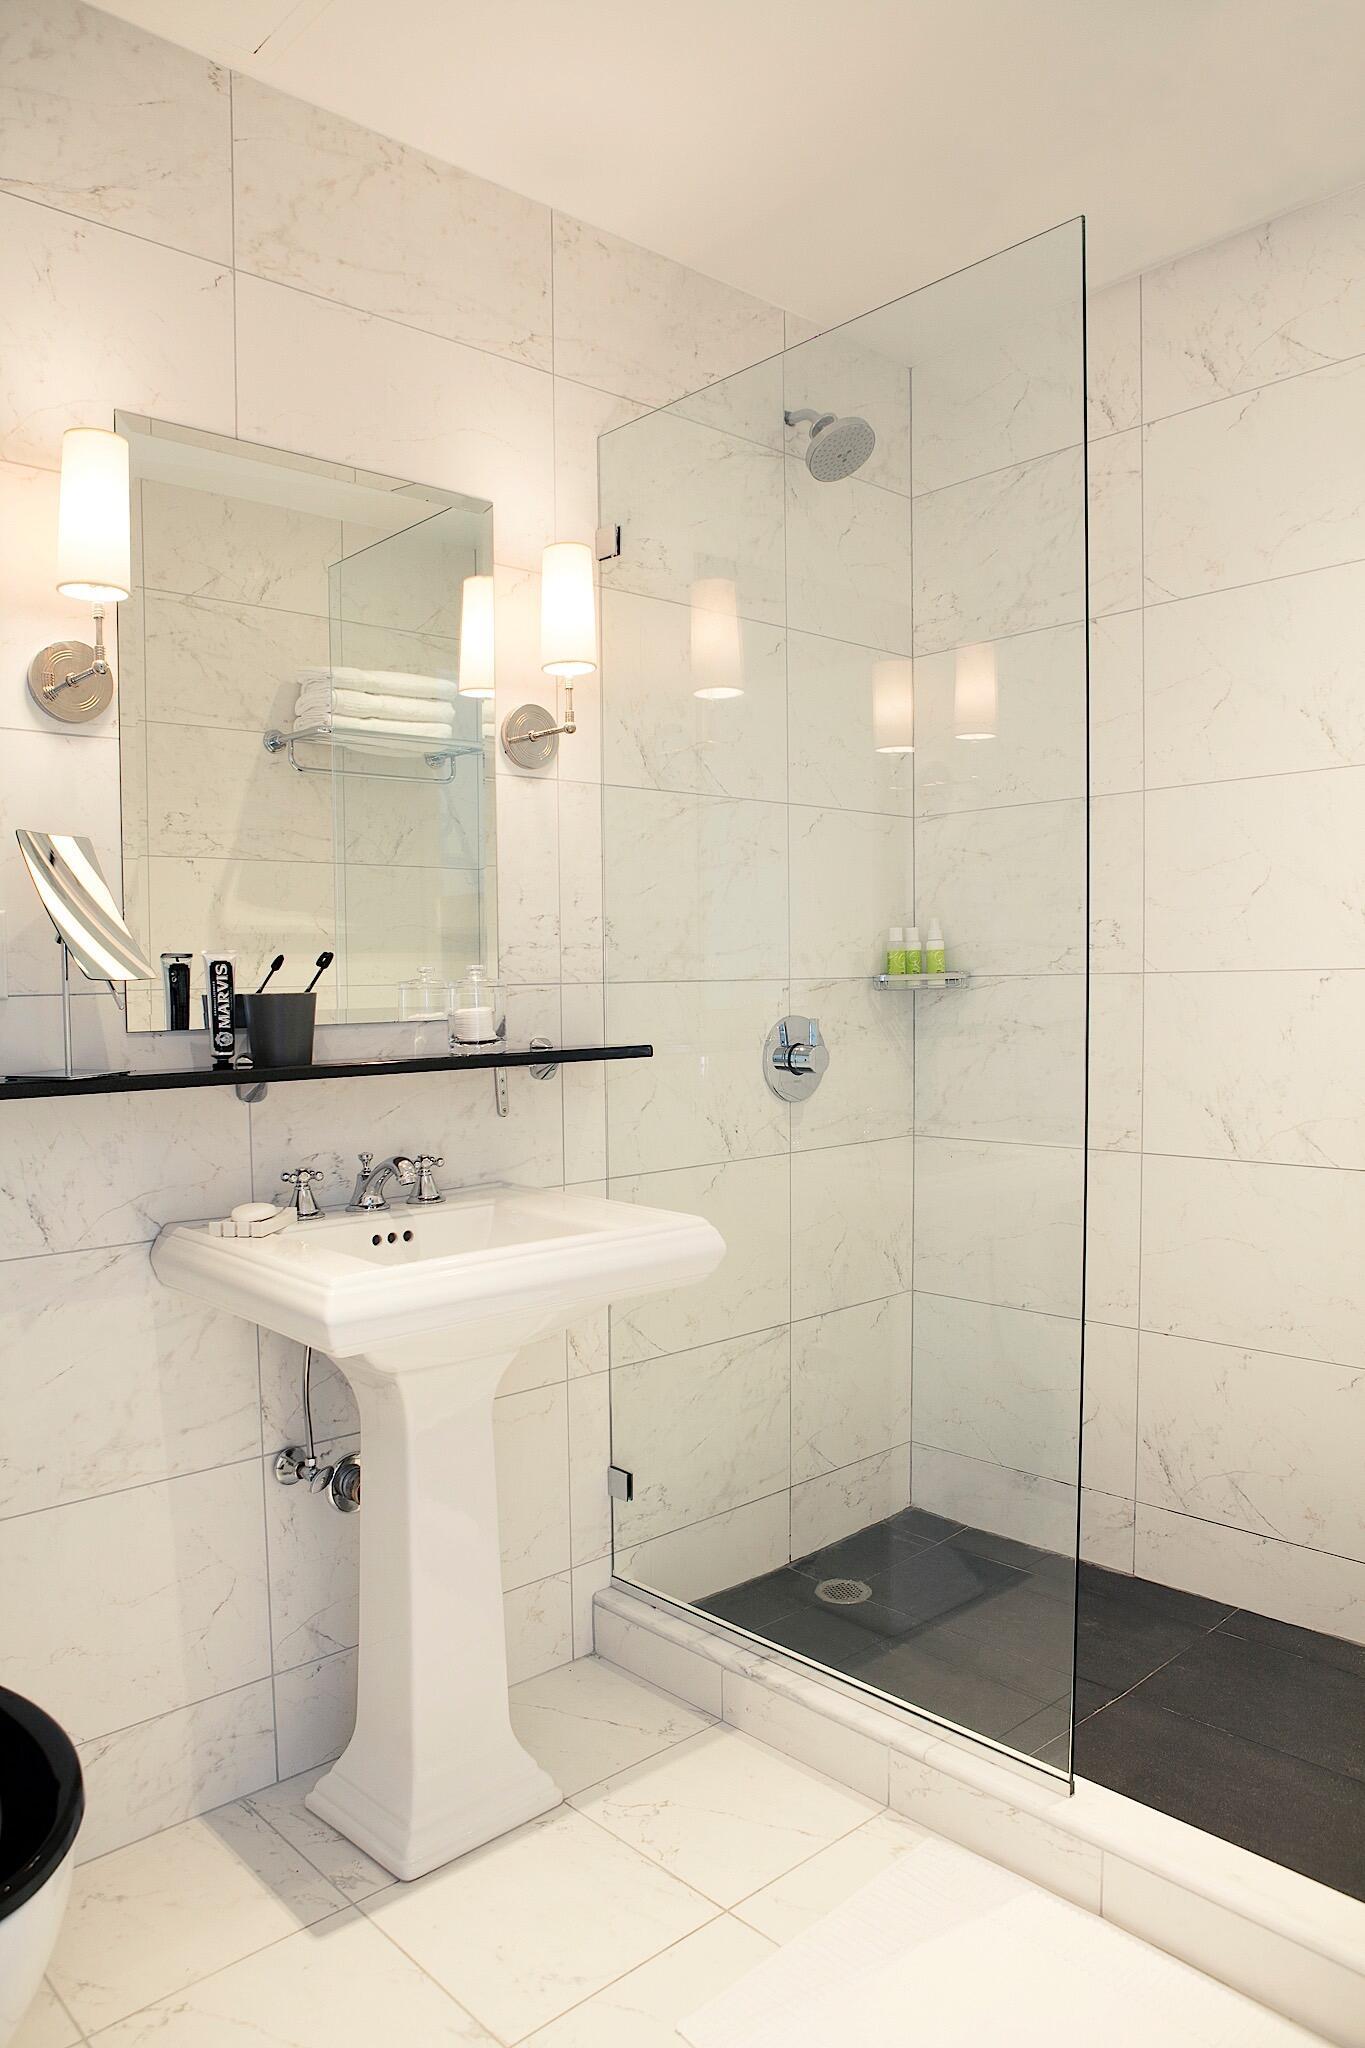 Bathroom Interior with walk-in shower